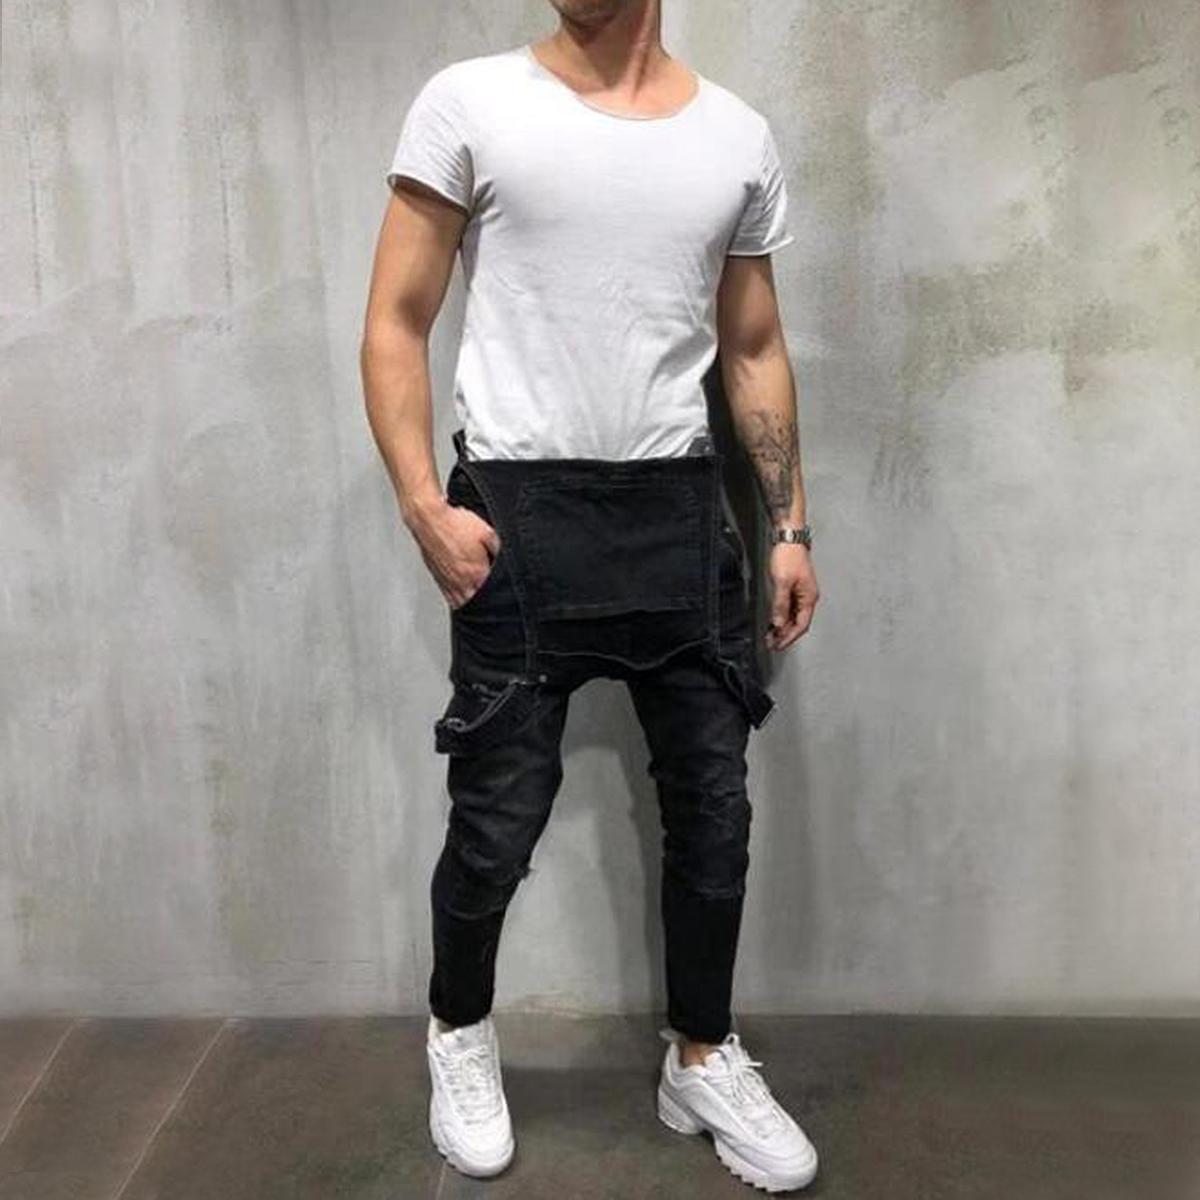 Correa-De-Hombre-Denim-Jeans-Mono-Mono-corto-Dungaree-Pantalones-Cortos-Deshilachados-Babero-En miniatura 26